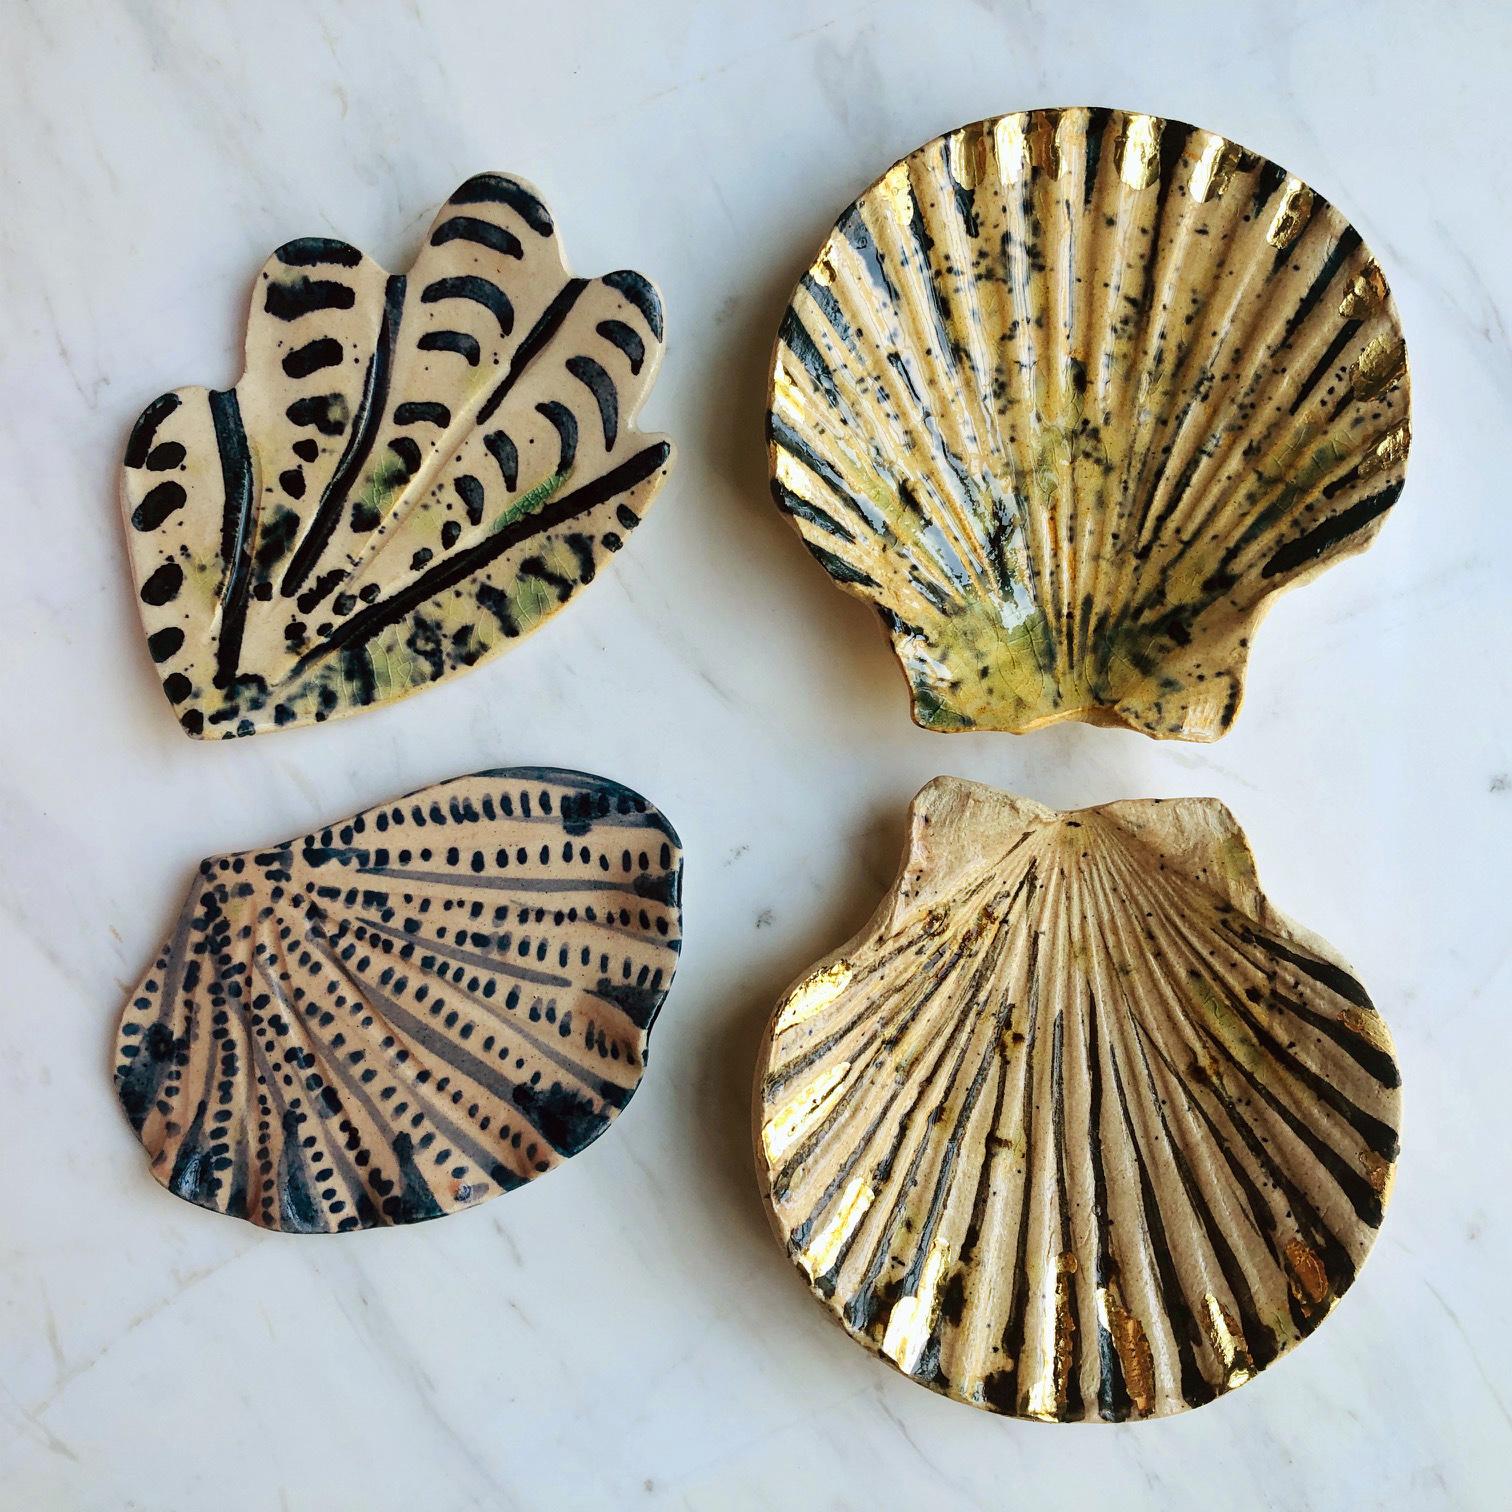 shells 168-171 SOLD